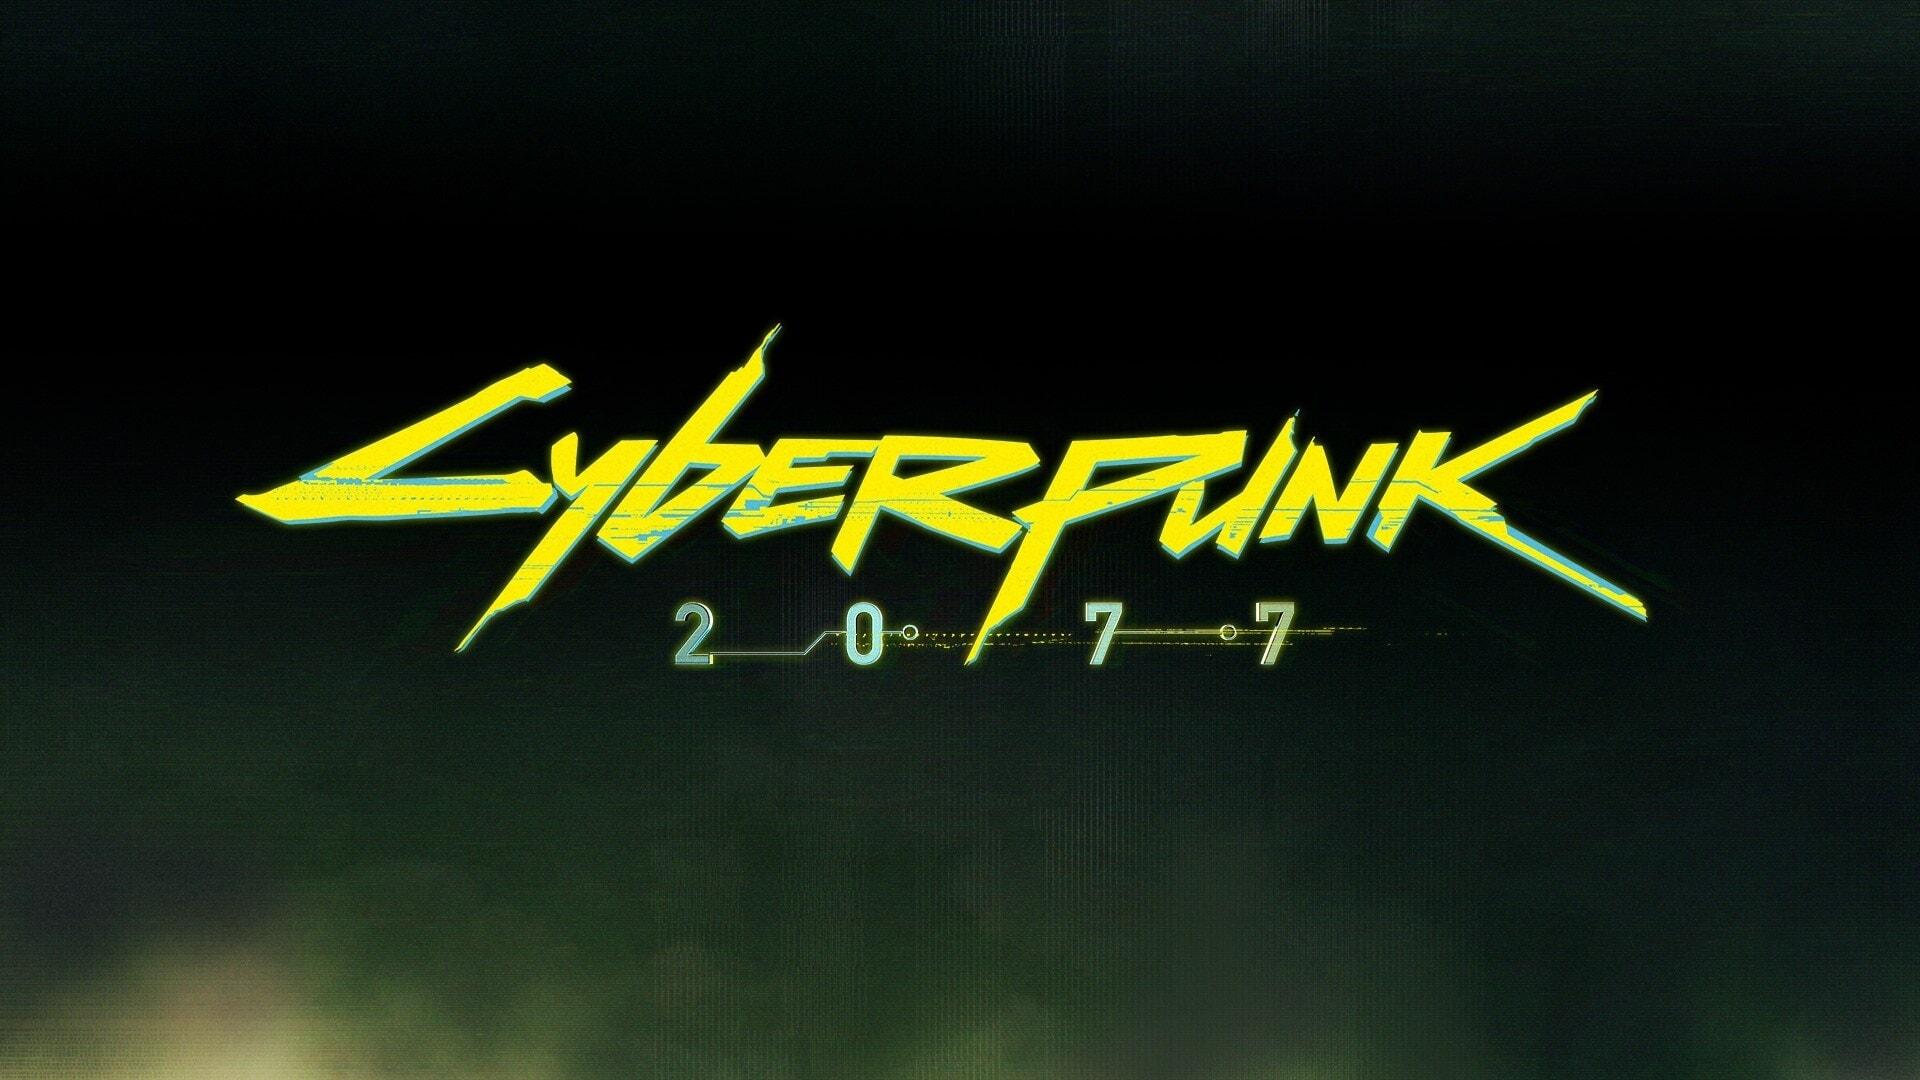 Clamorosa svendita di Cyberpunk 2077: a solo 10 dollari in USA